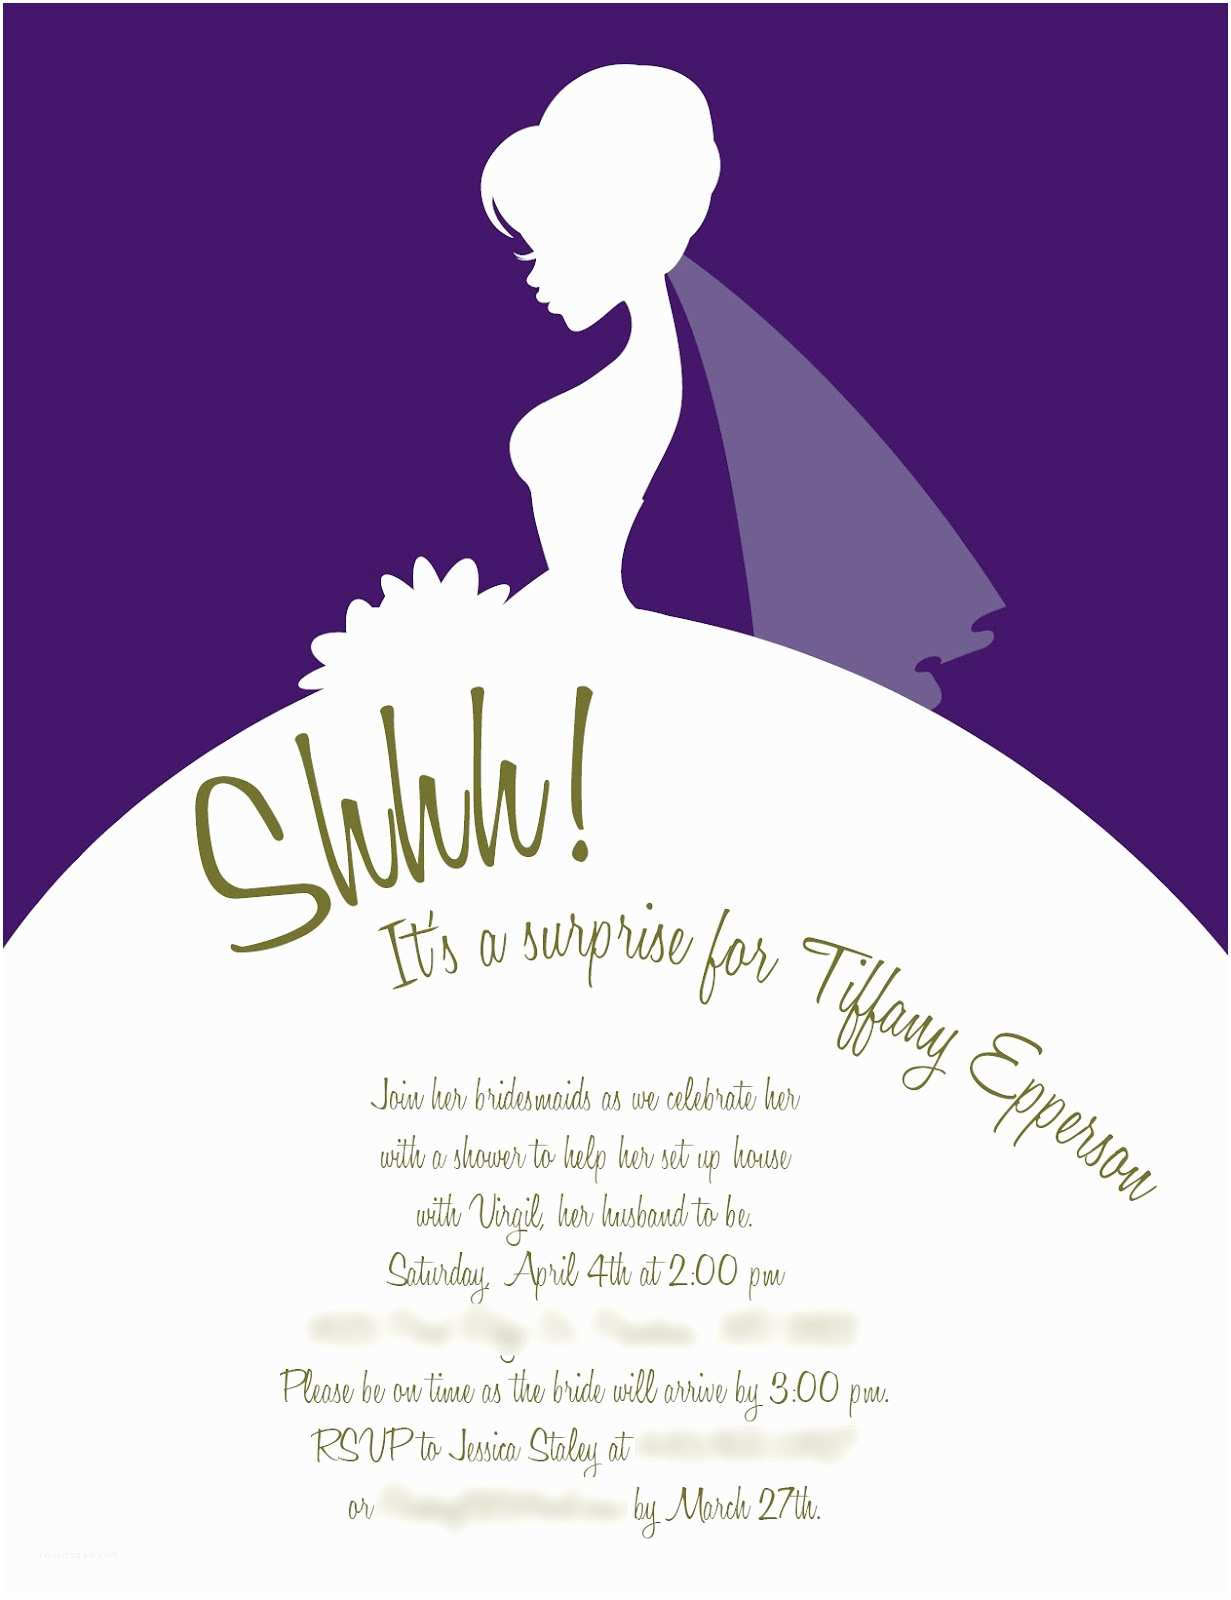 Snapfish Wedding Invitations top Album Snapfish Wedding Invitations